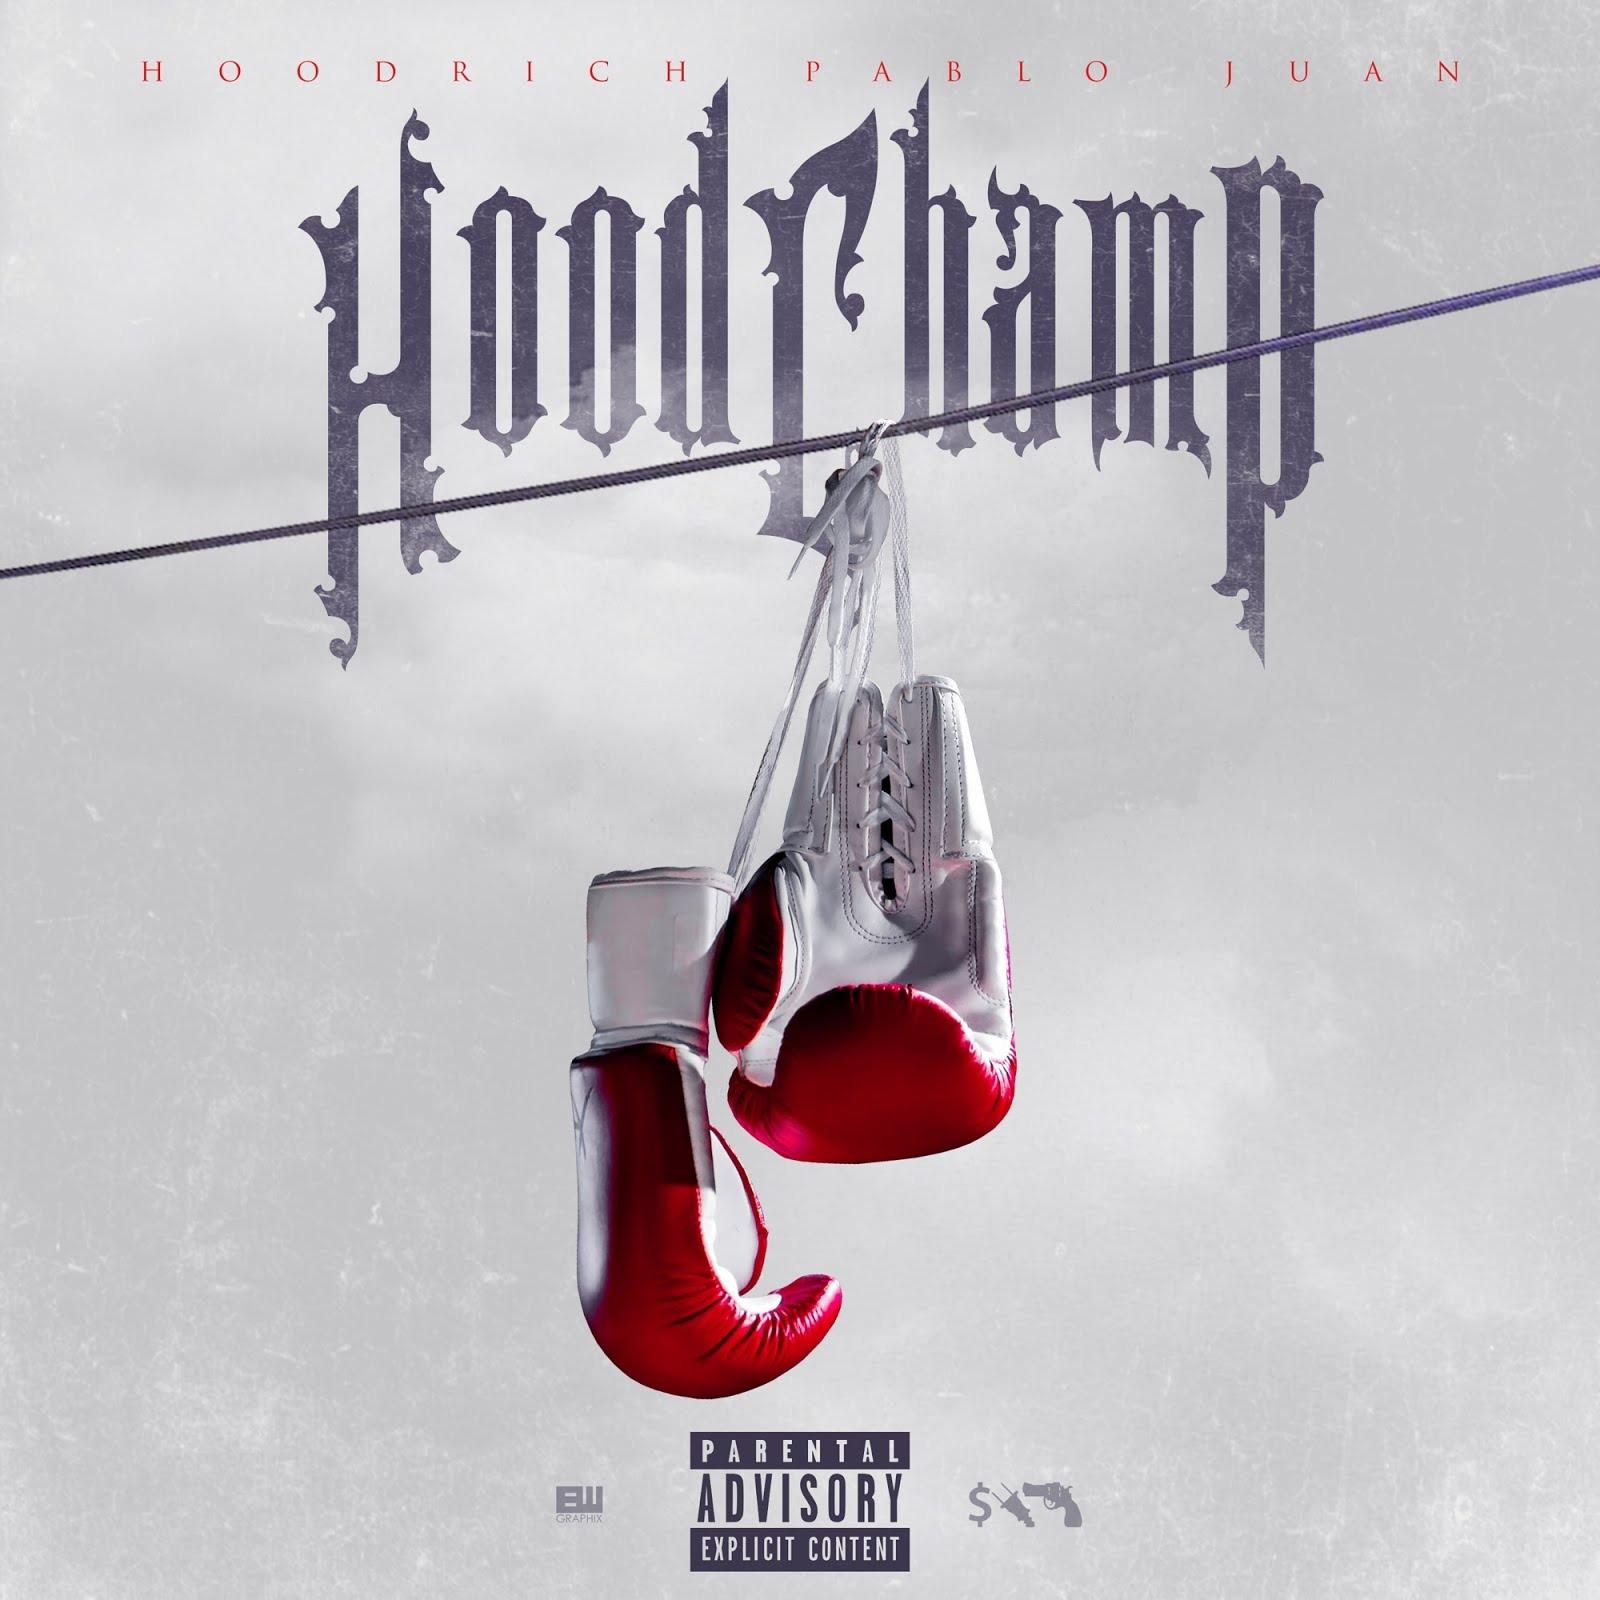 HoodRich Pablo Juan - Hood Champ